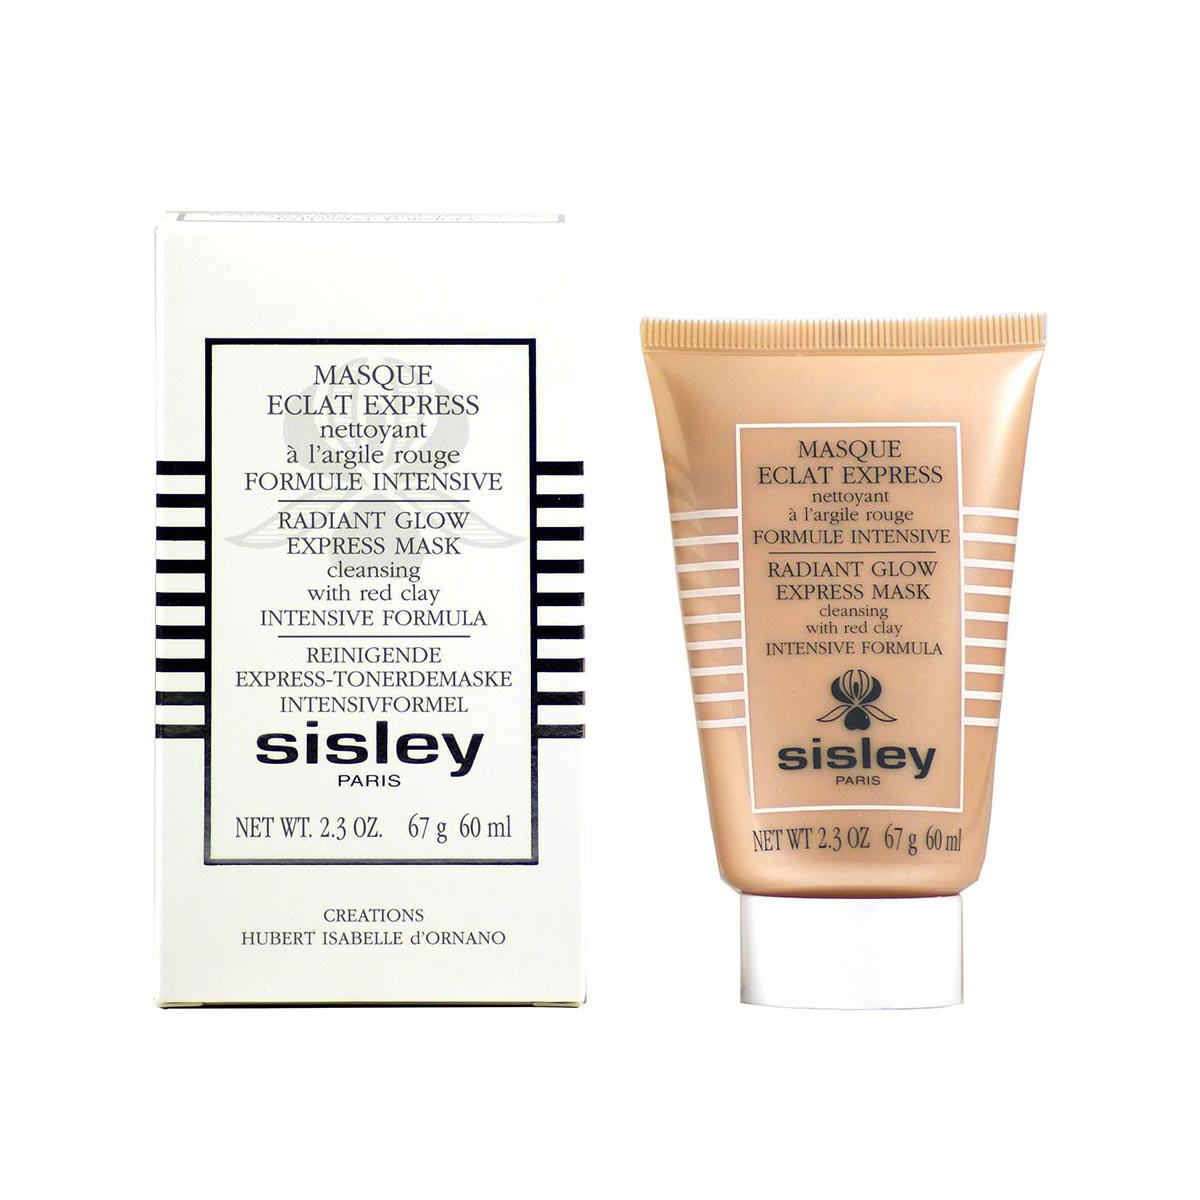 Sisley masque eclat express nettoyant creme 60ml